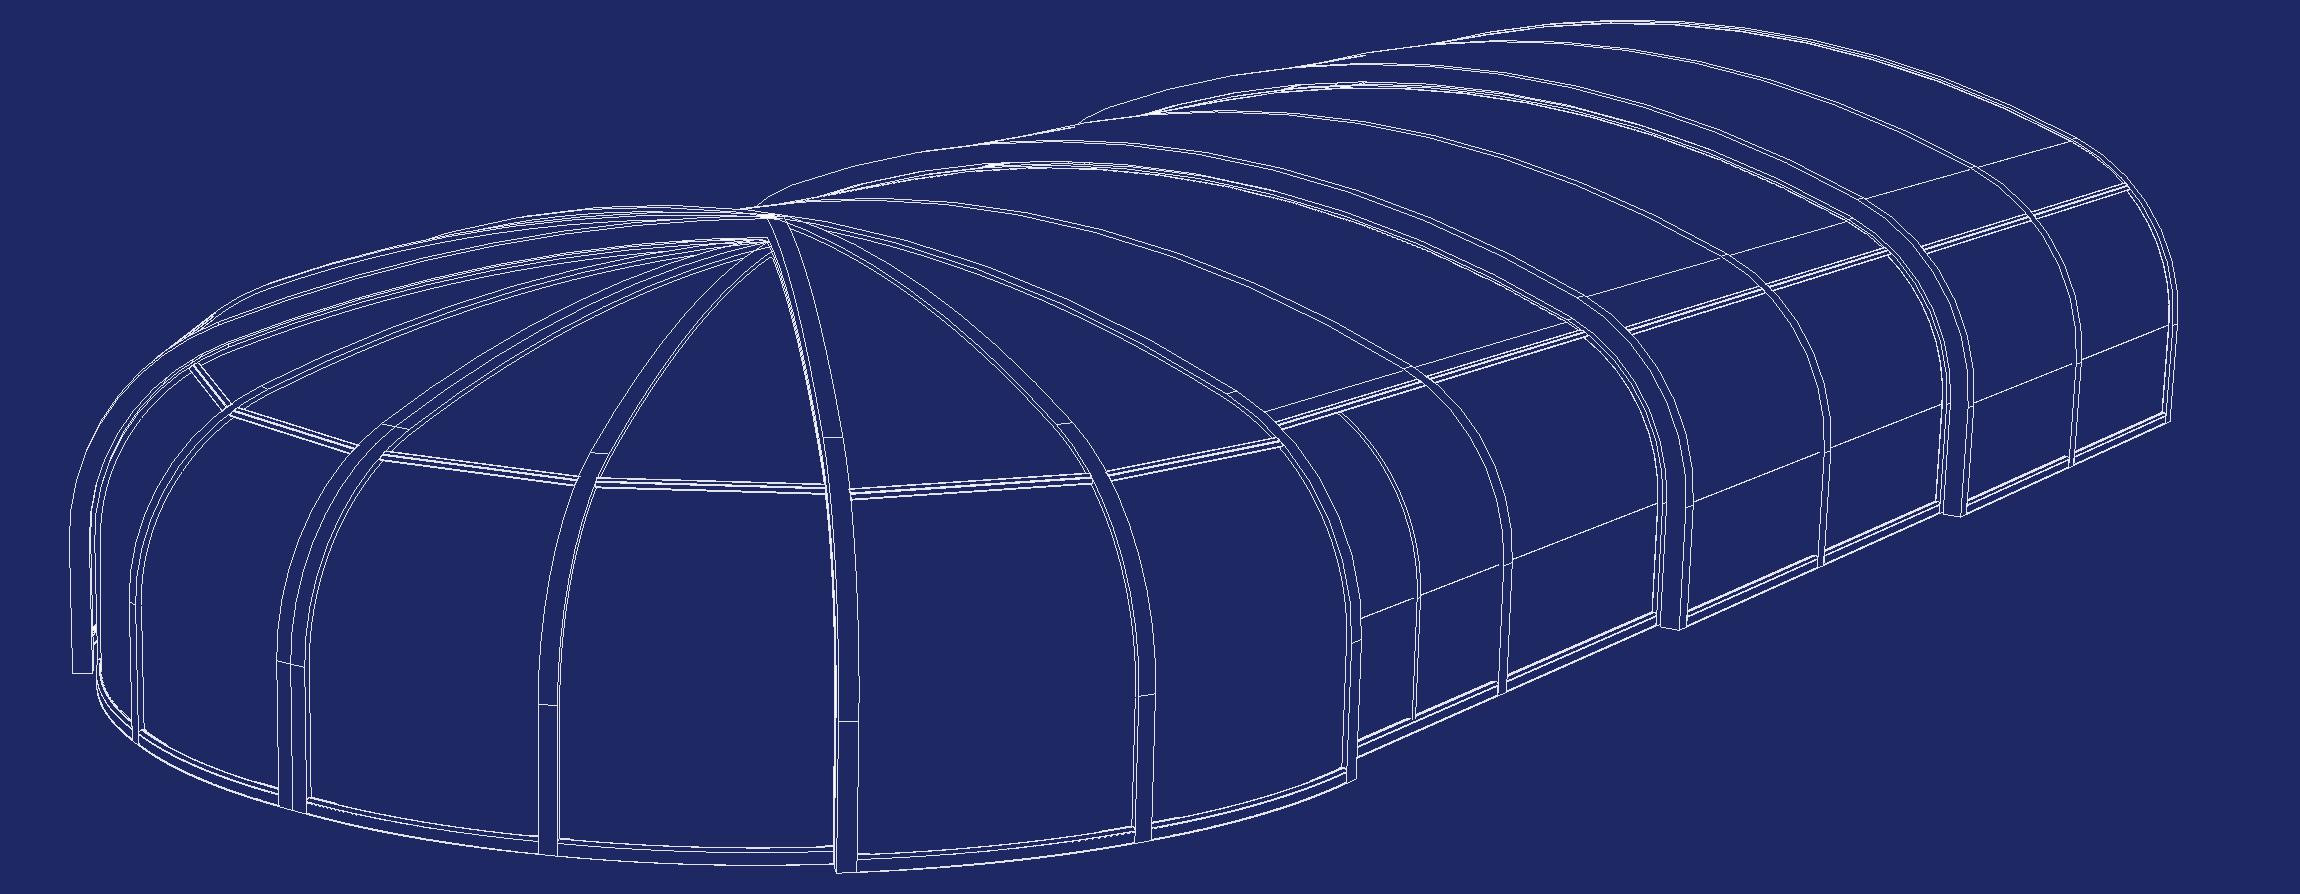 Abri piscine bois haut cintré rotonde schéma